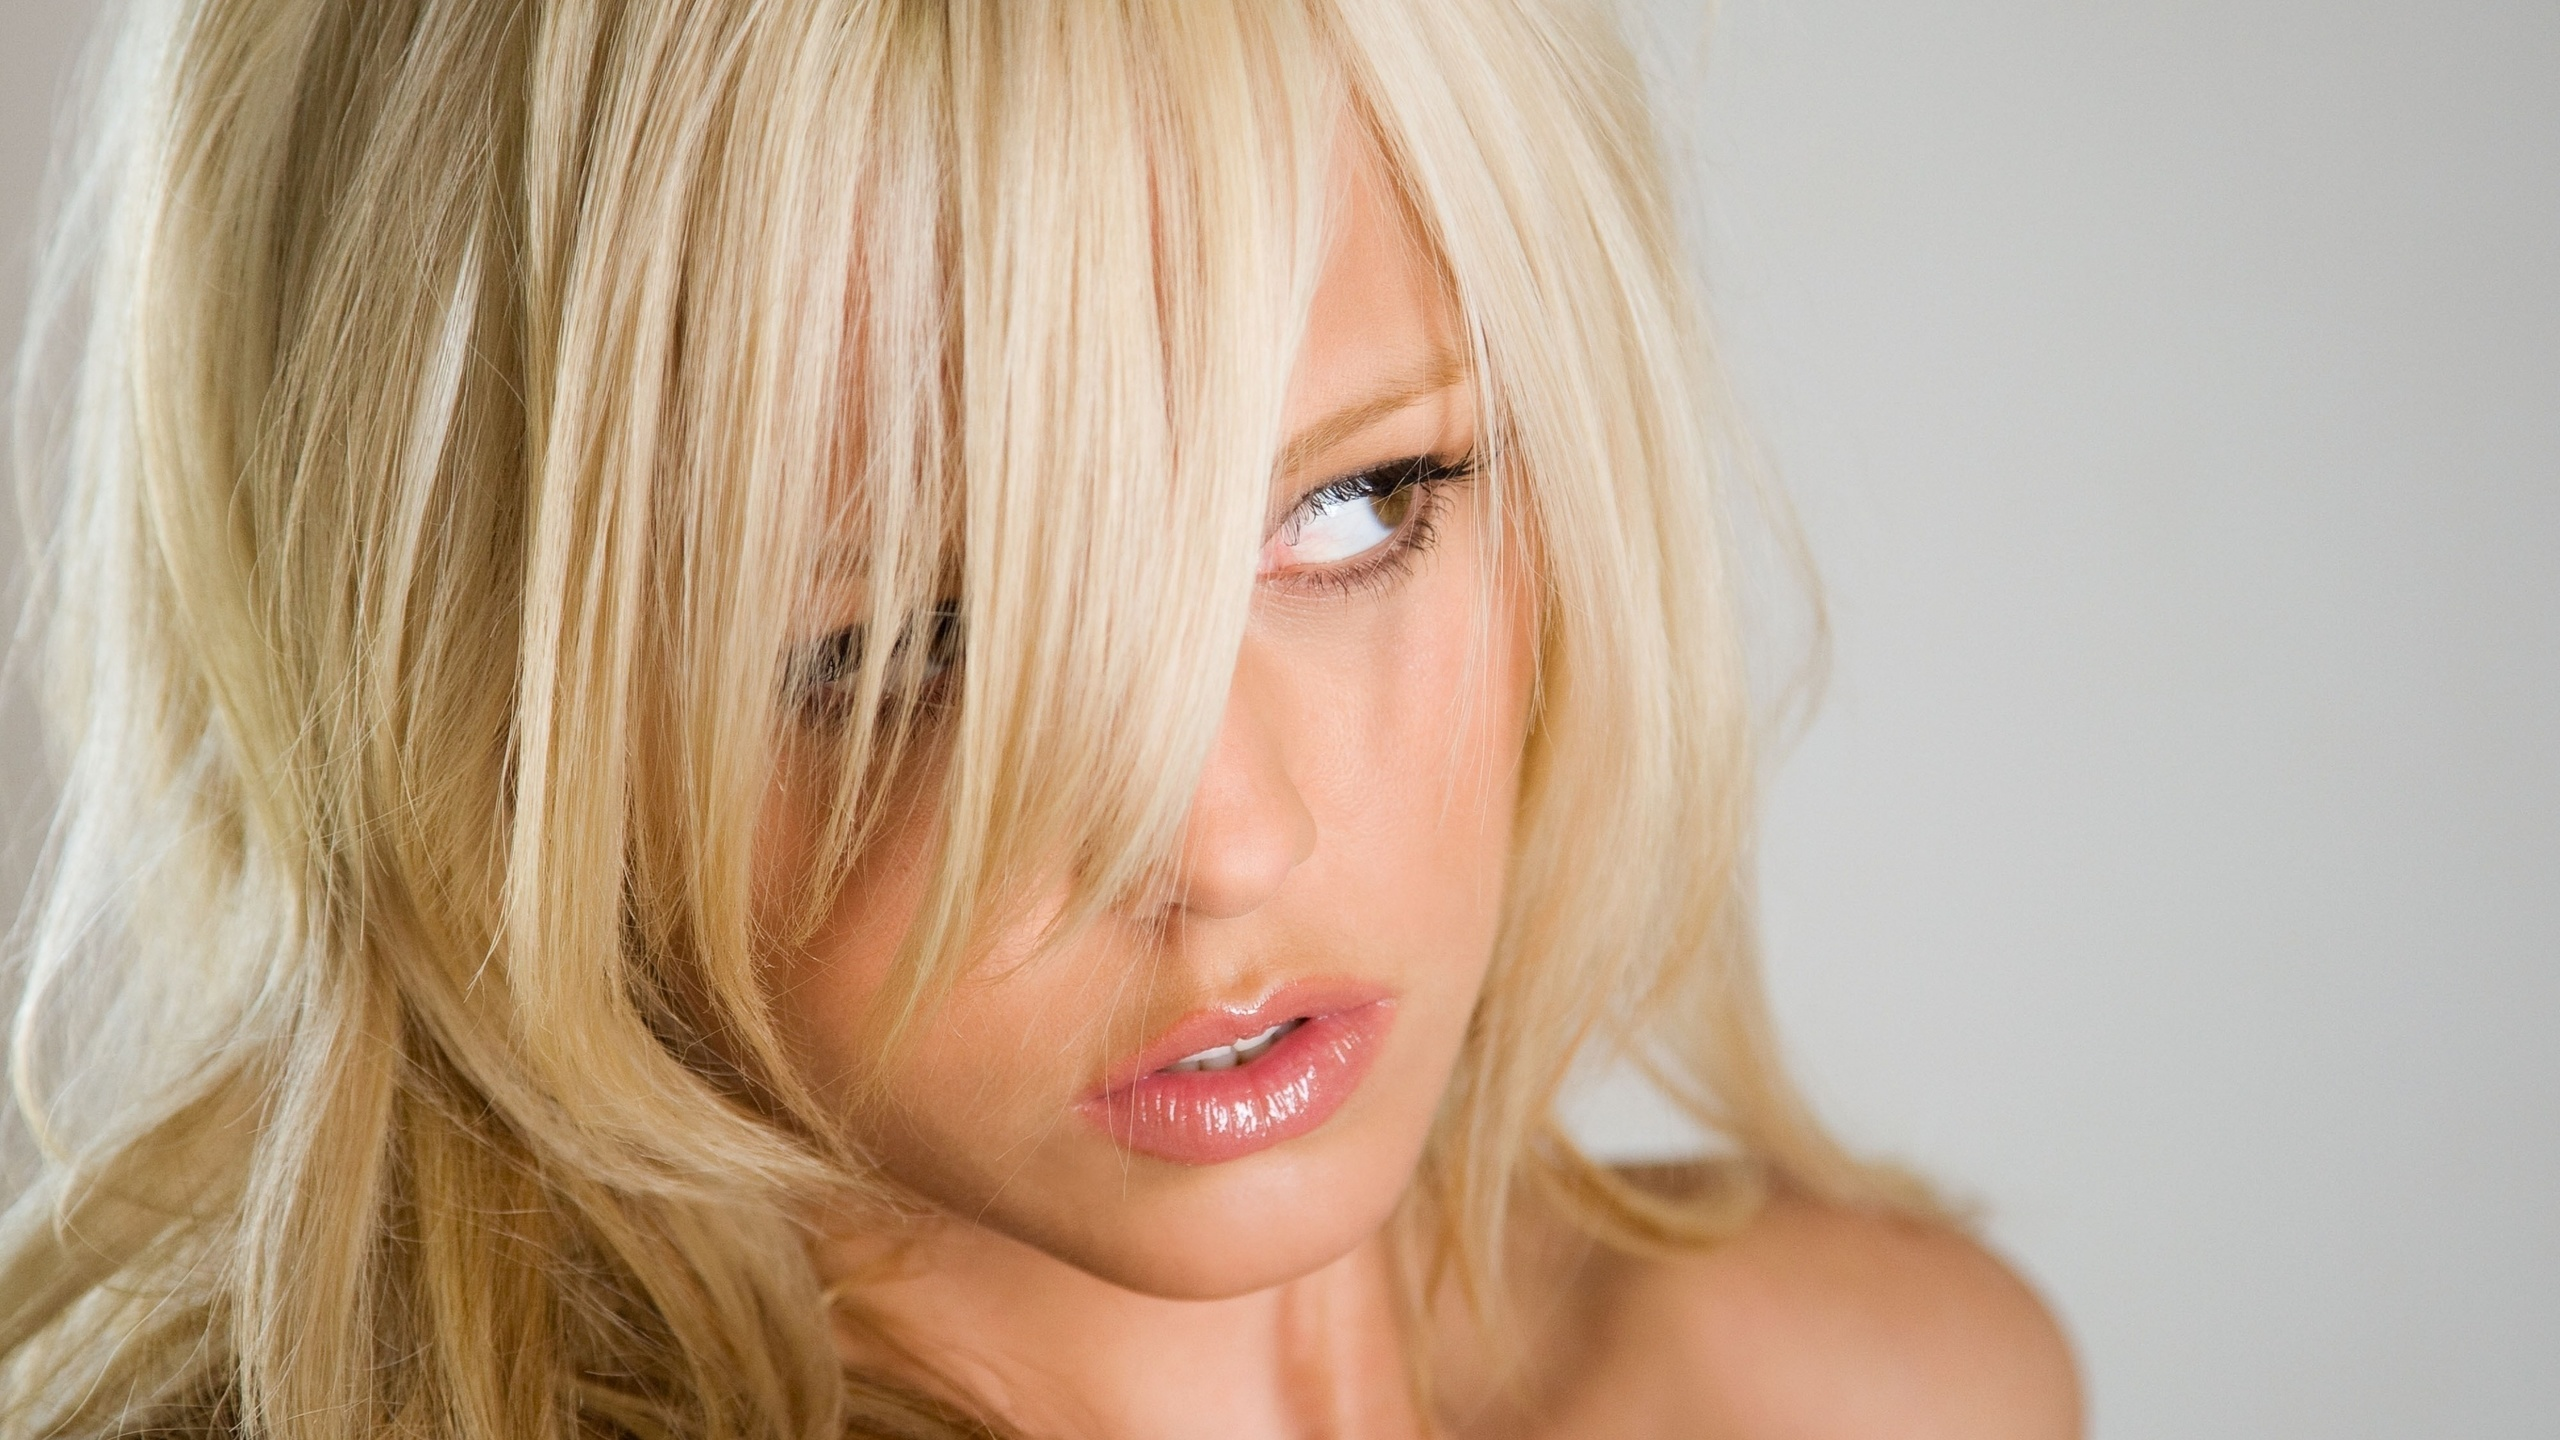 брюнетка на члене а блондинка на лице